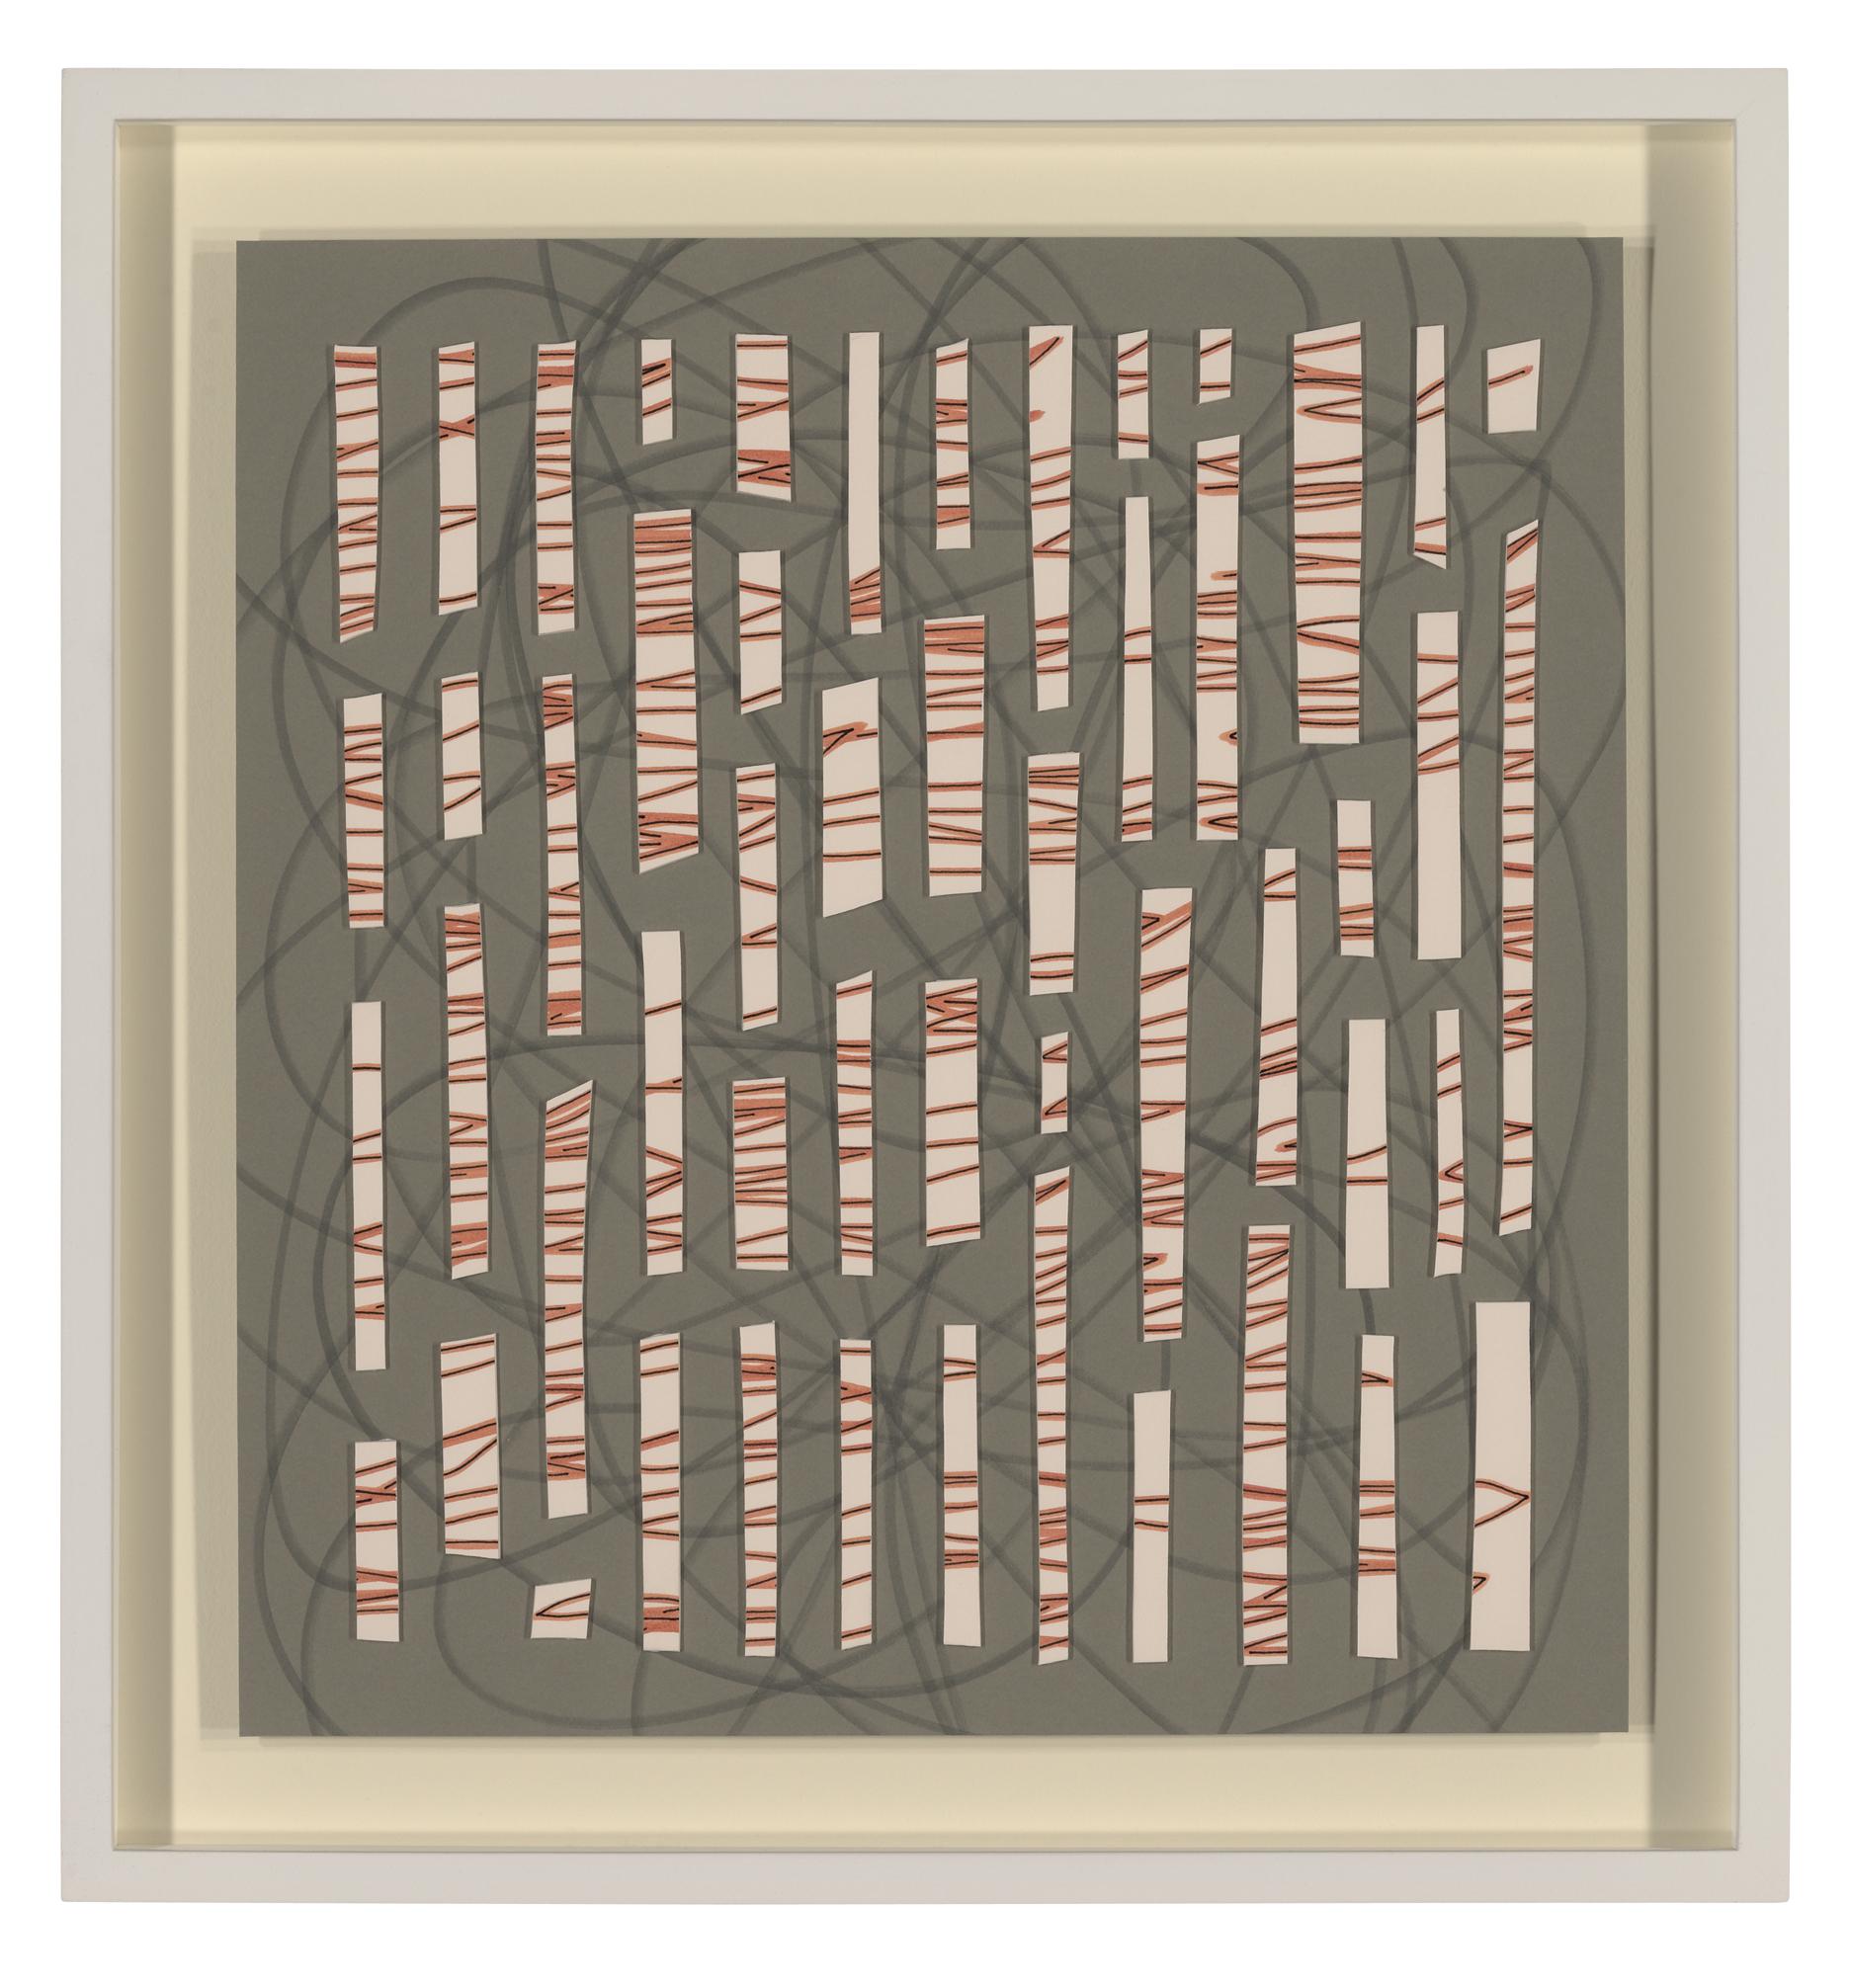 Tom Mueske, Collage, 2011